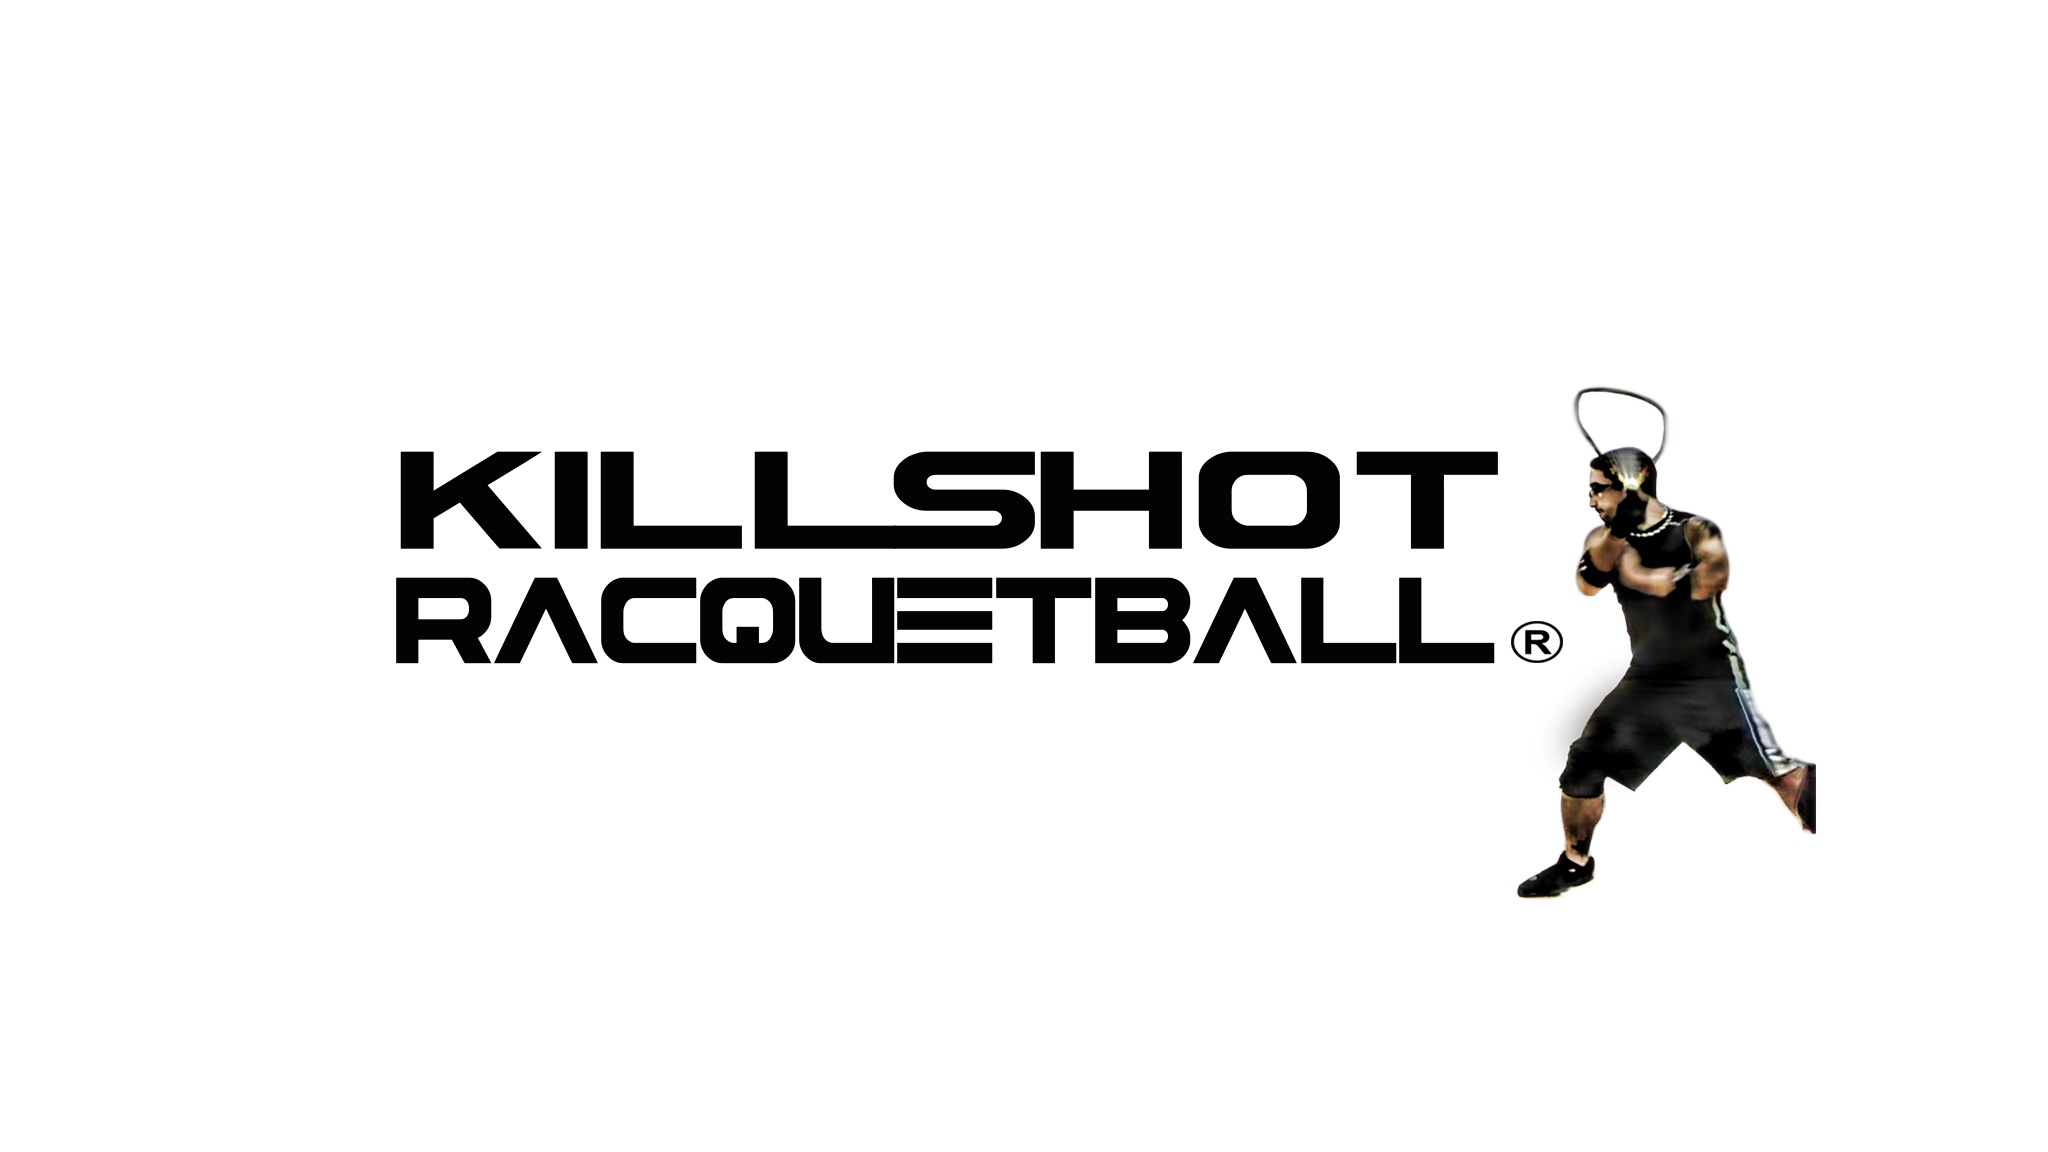 Killshot Racquetball